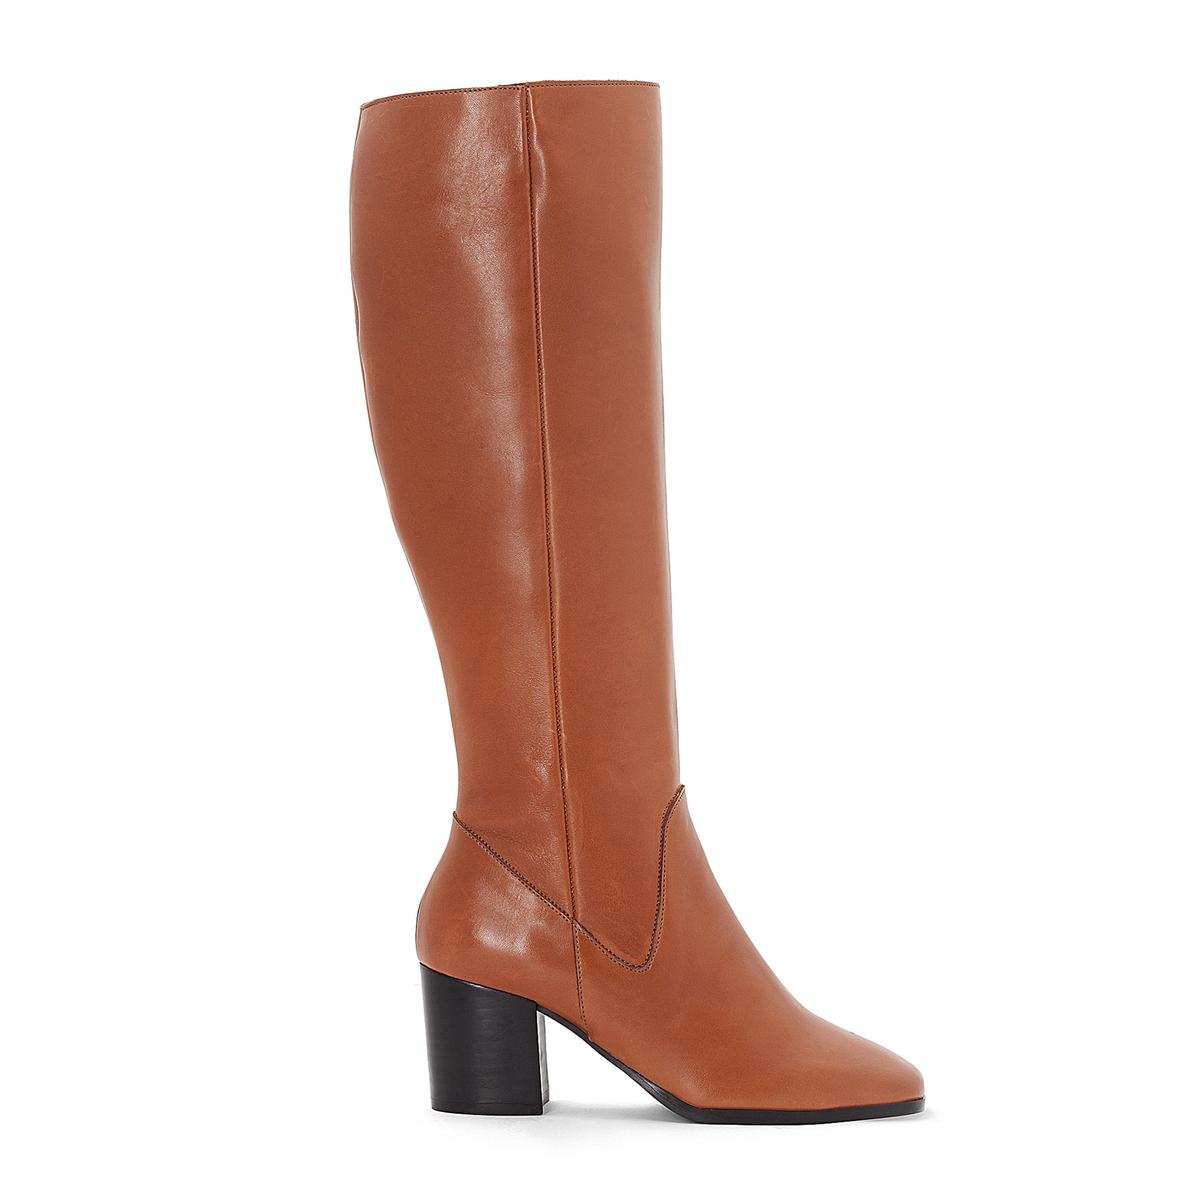 Сапоги кожаные на среднем каблуке сапоги кожаные на плоском каблуке 1137